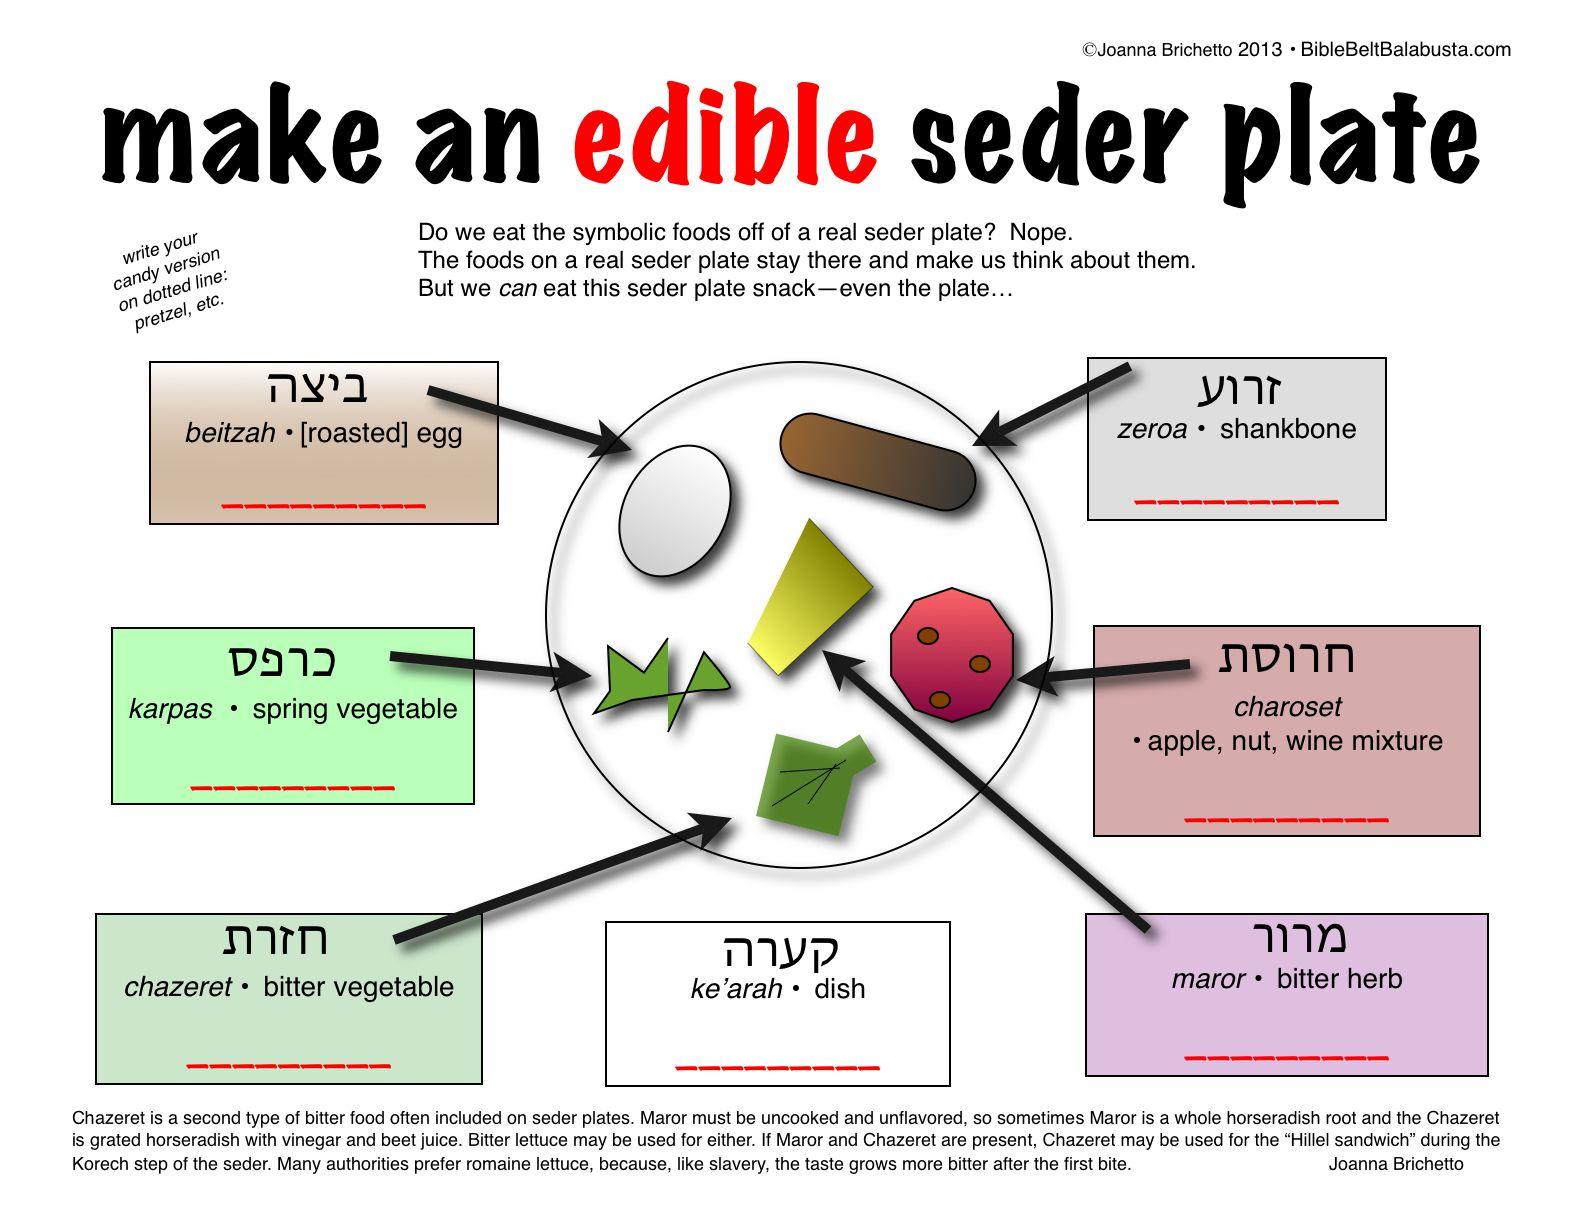 Make an edible seder plate printable fill in with your choice of make an edible seder plate printable fill in with your choice of representation buycottarizona